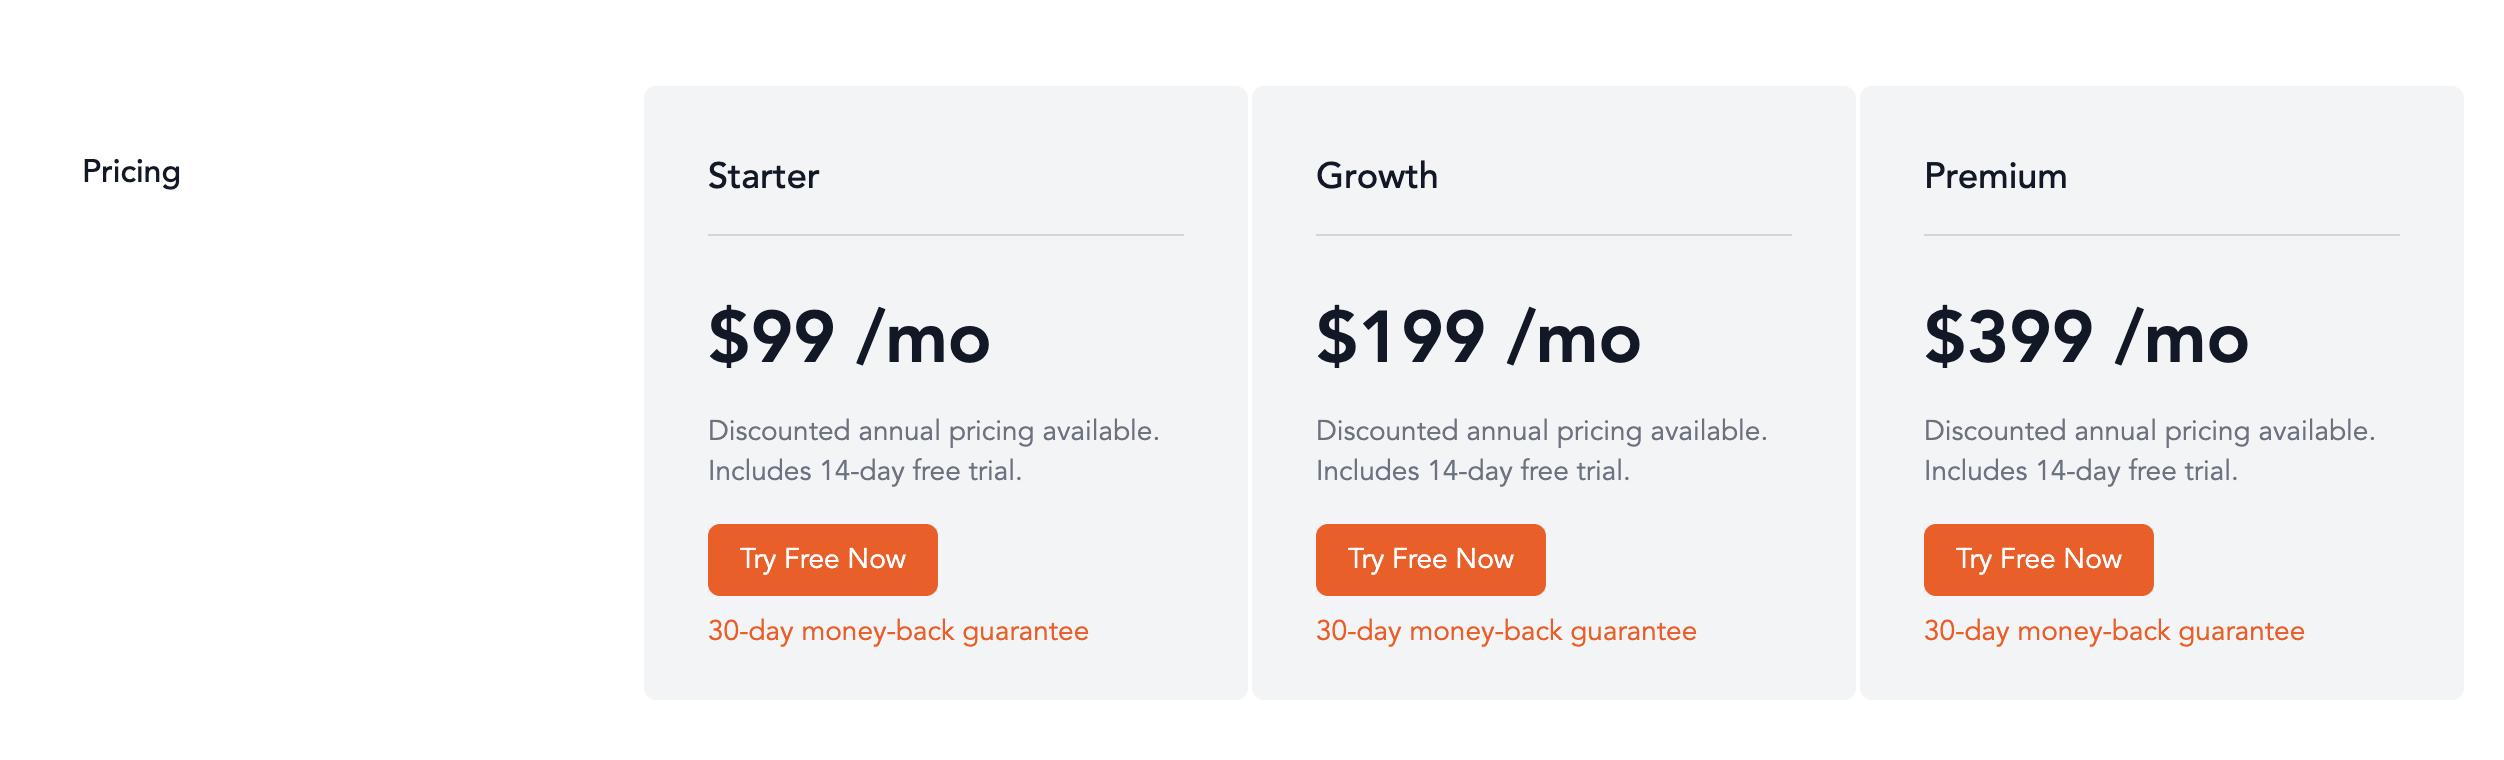 Nickelled pricing plans